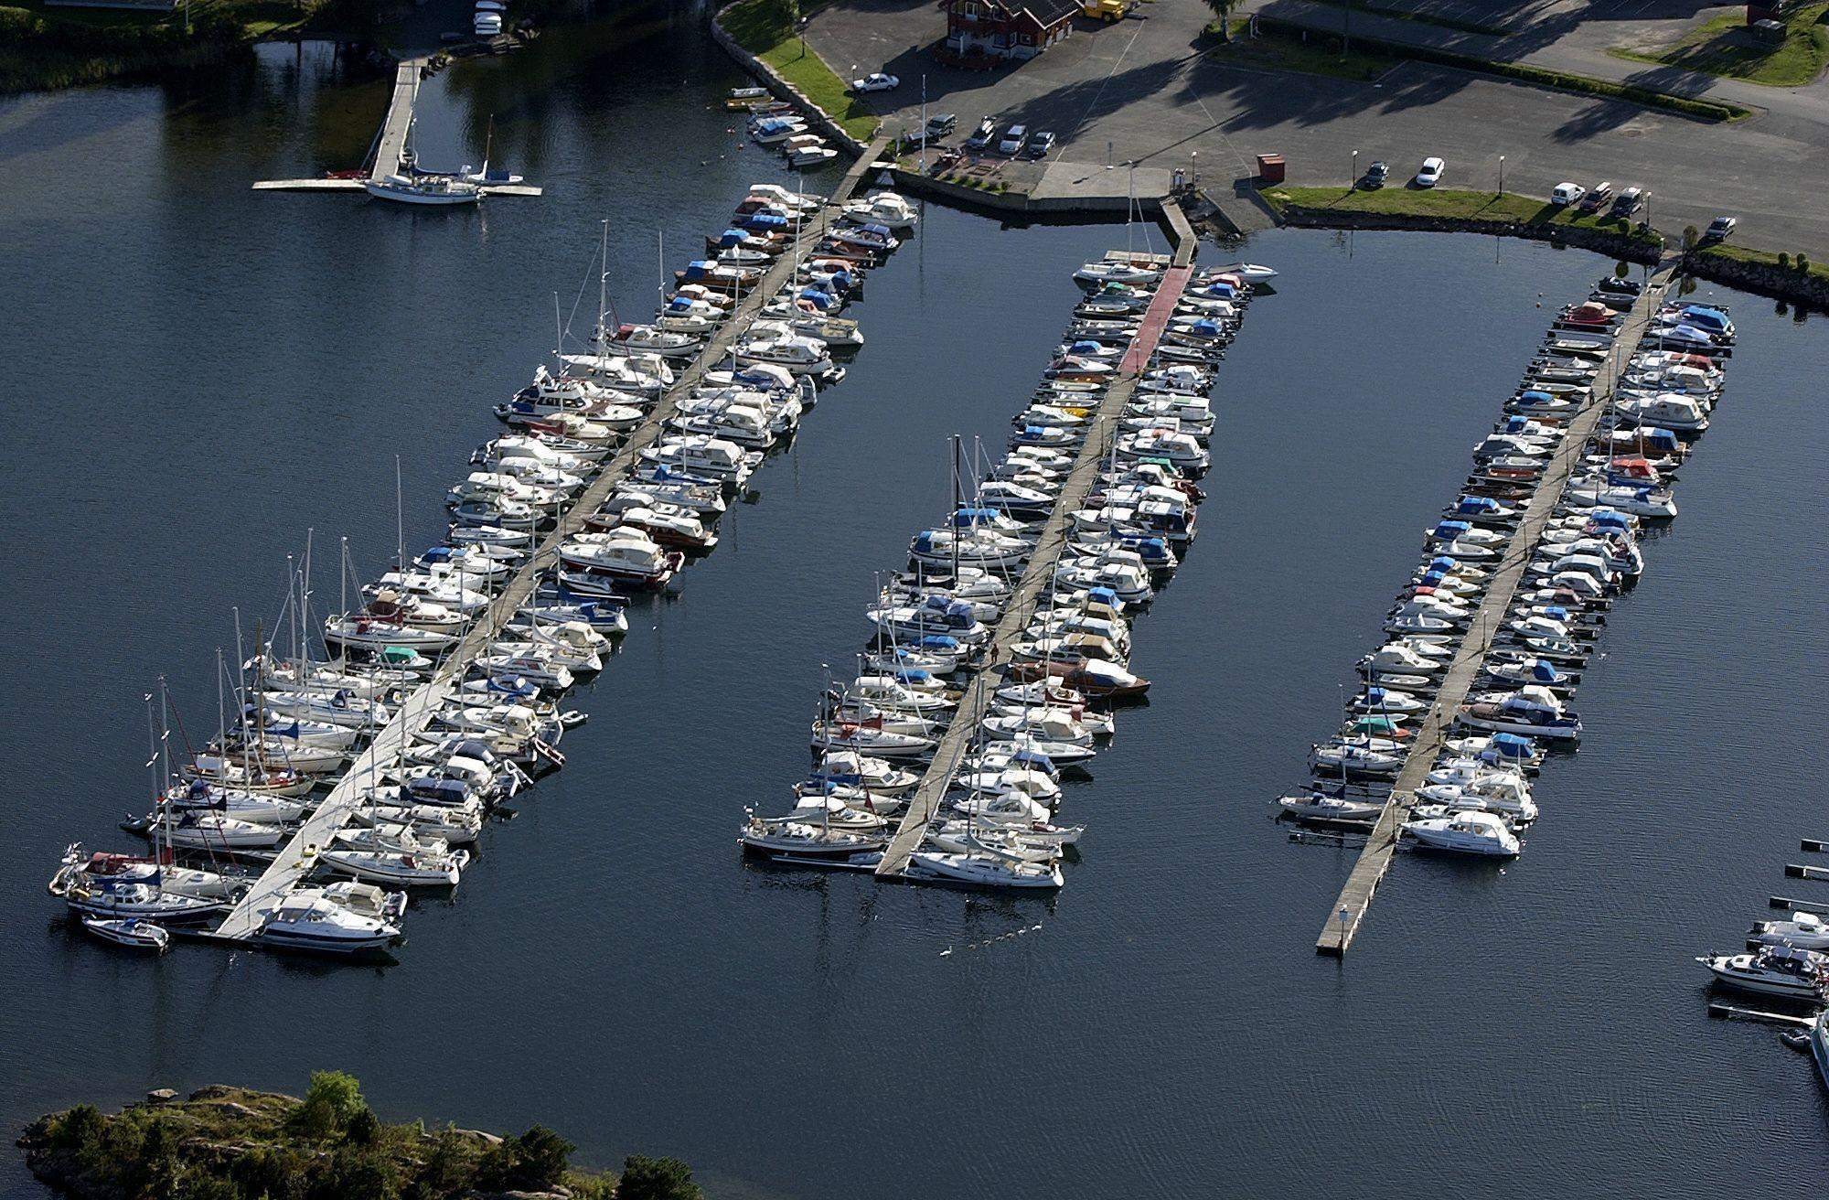 Sætre båtforening